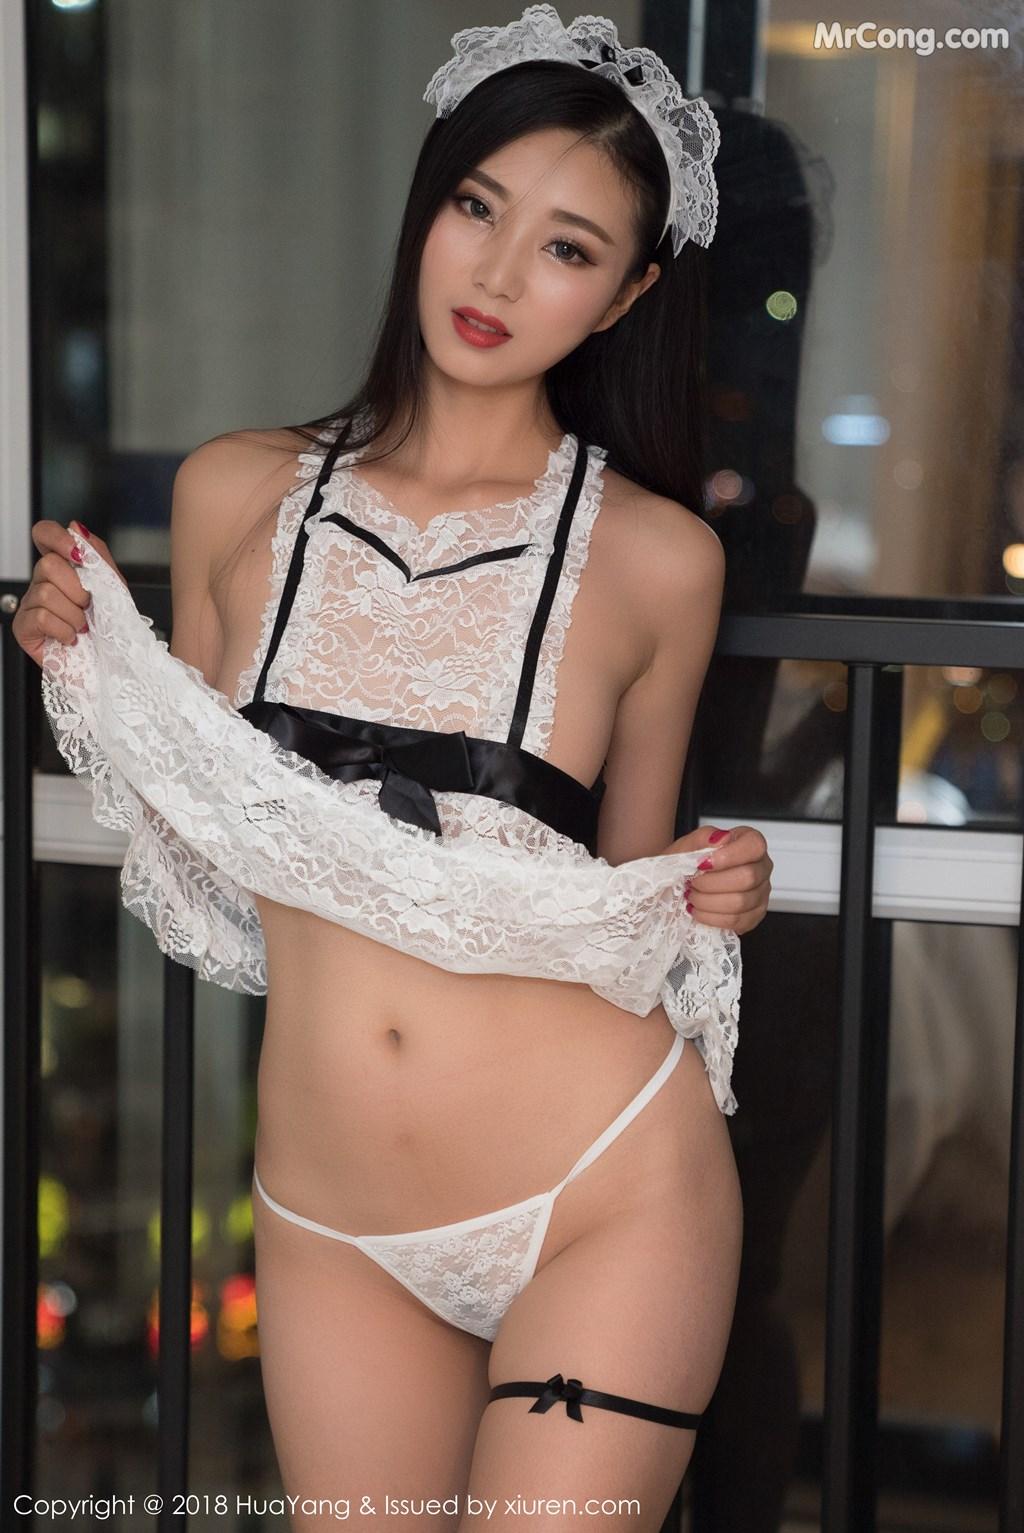 Image HuaYang-2018-02-28-Vol.033-KiKi-MrCong.com-036 in post HuaYang 2018-02-28 Vol.033: Người mẫu 宋-KiKi (42 ảnh)